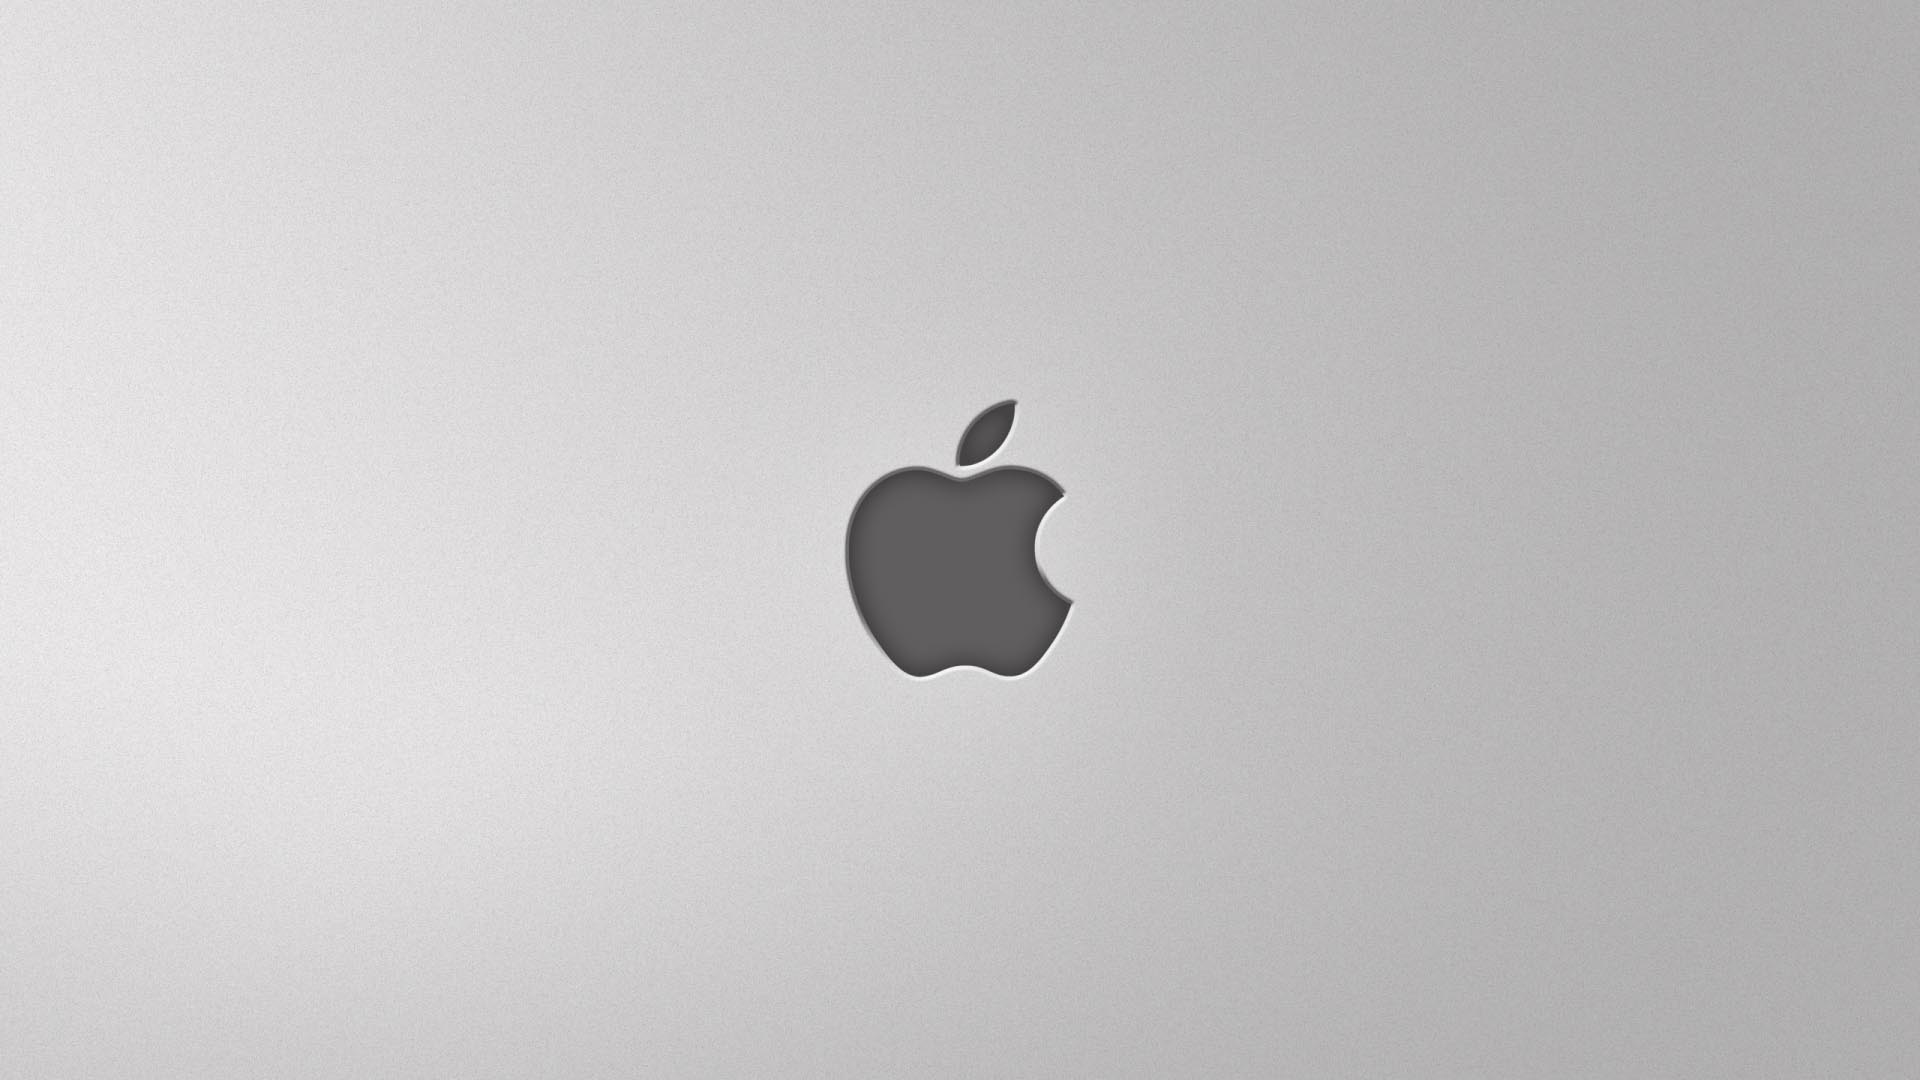 Apple Buys Edge AI Experts Xnor.ai For a Reported $200 Million